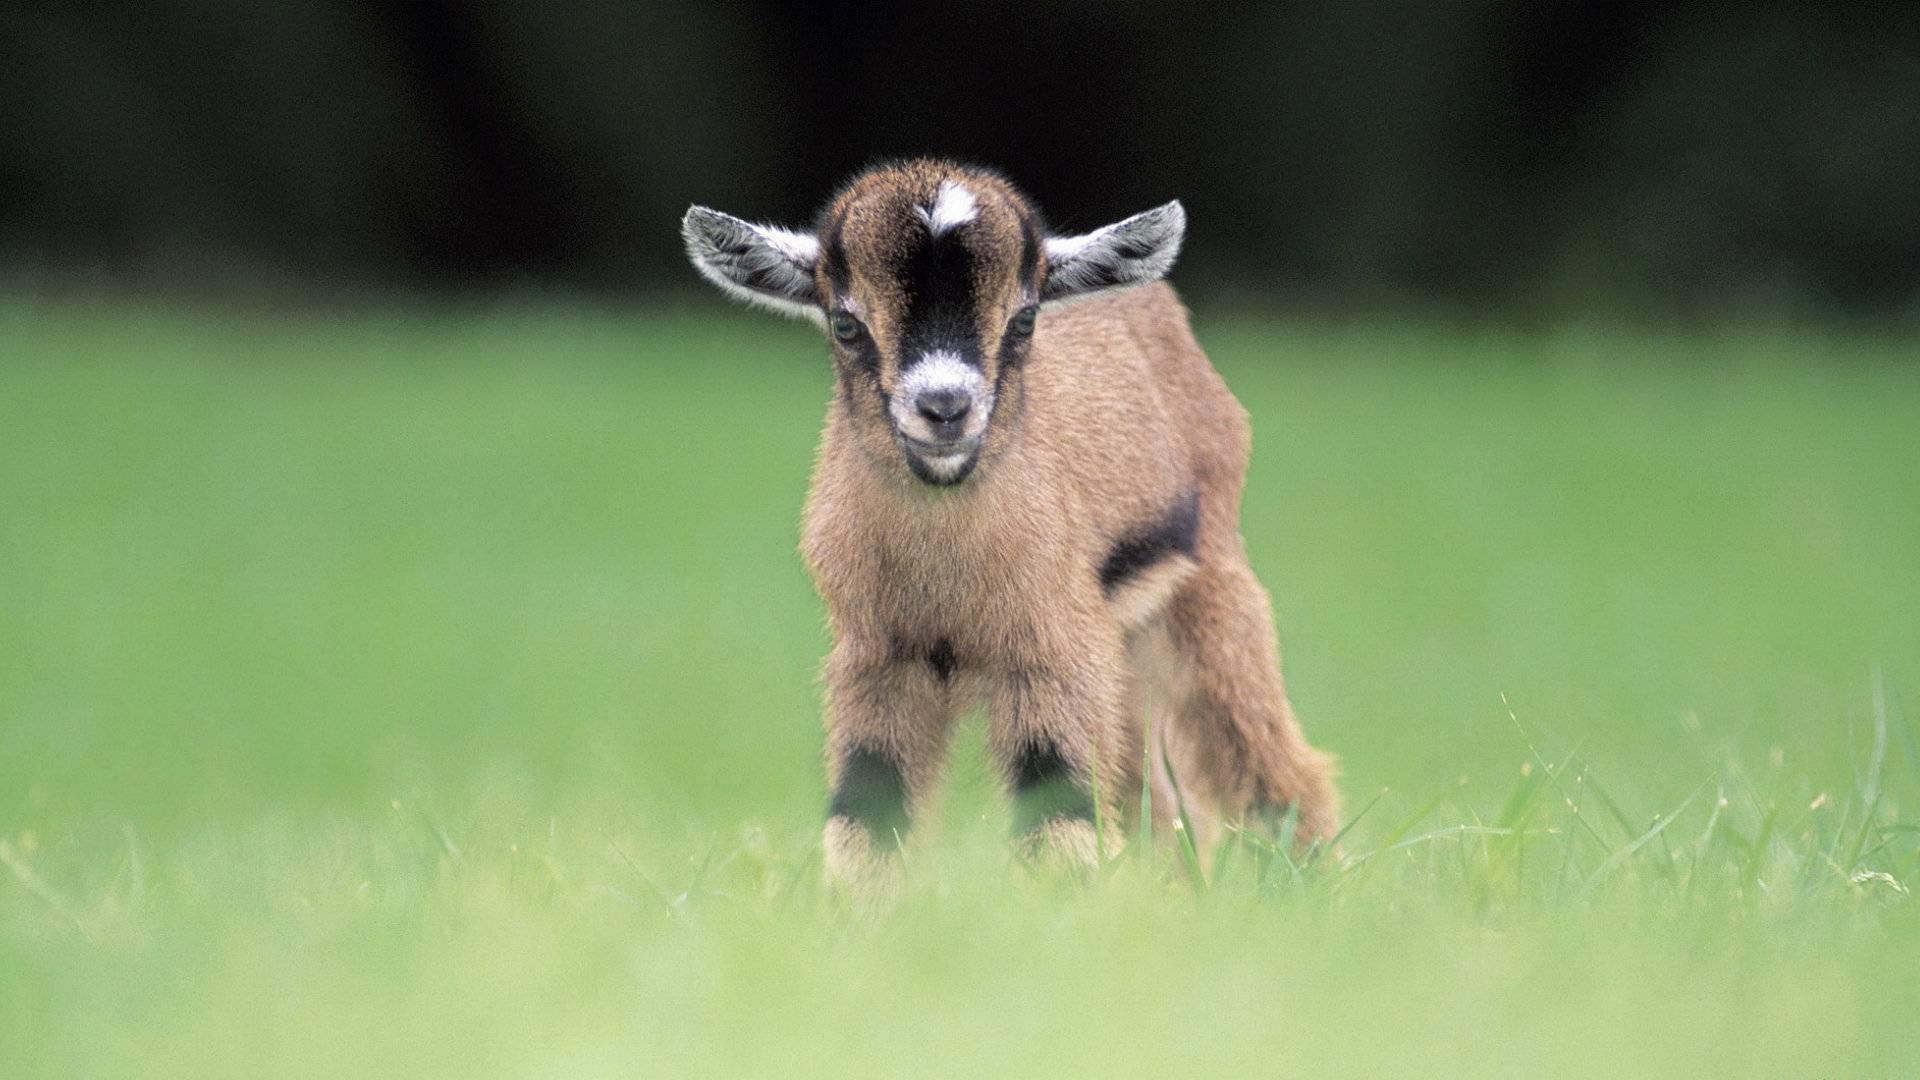 Adorable Goat